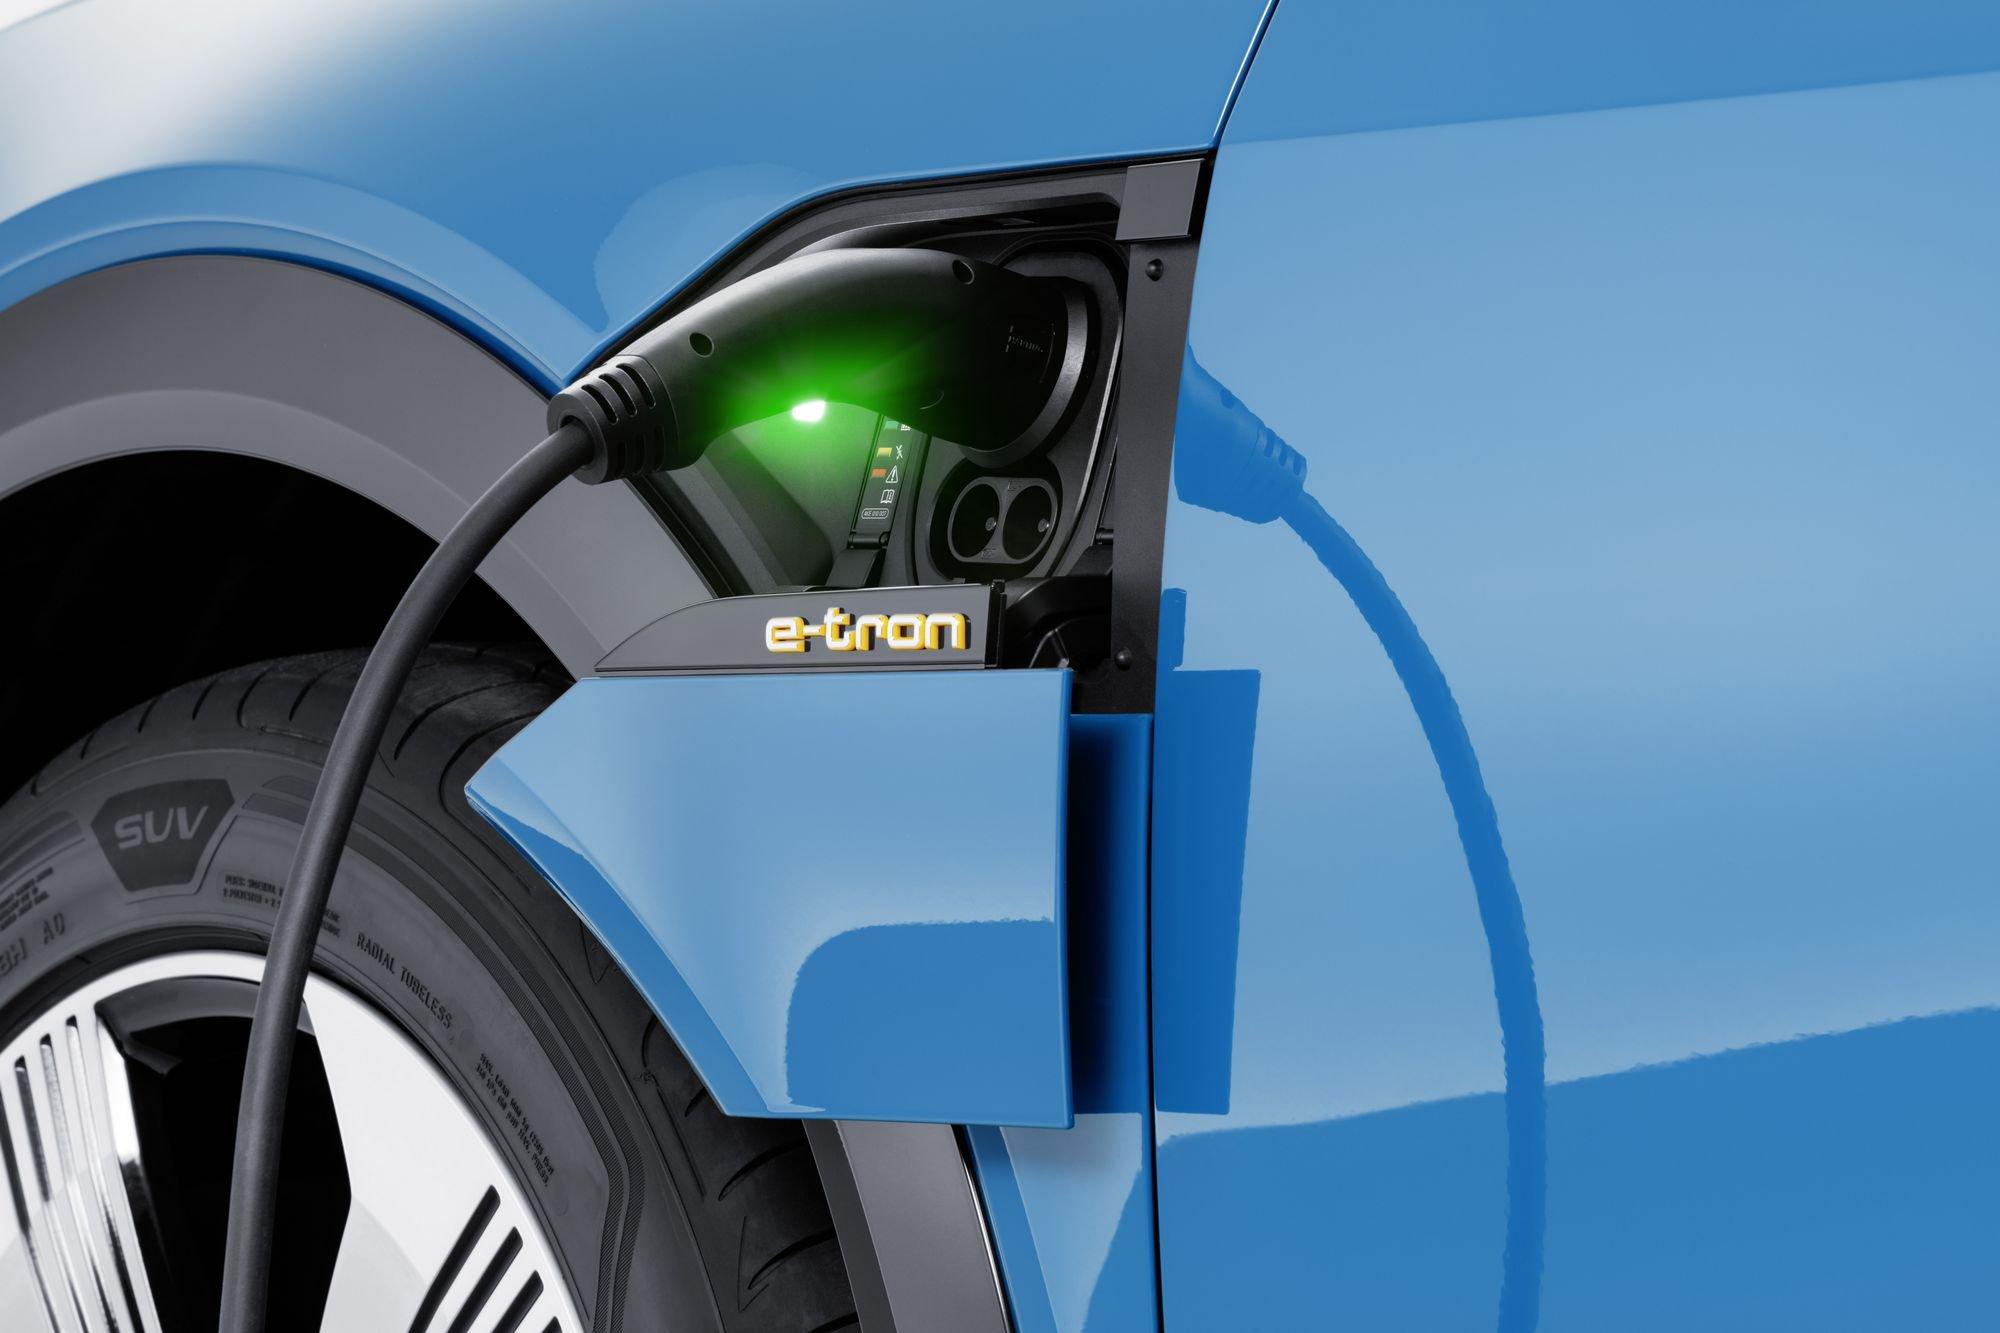 Audi E-tron suv charging